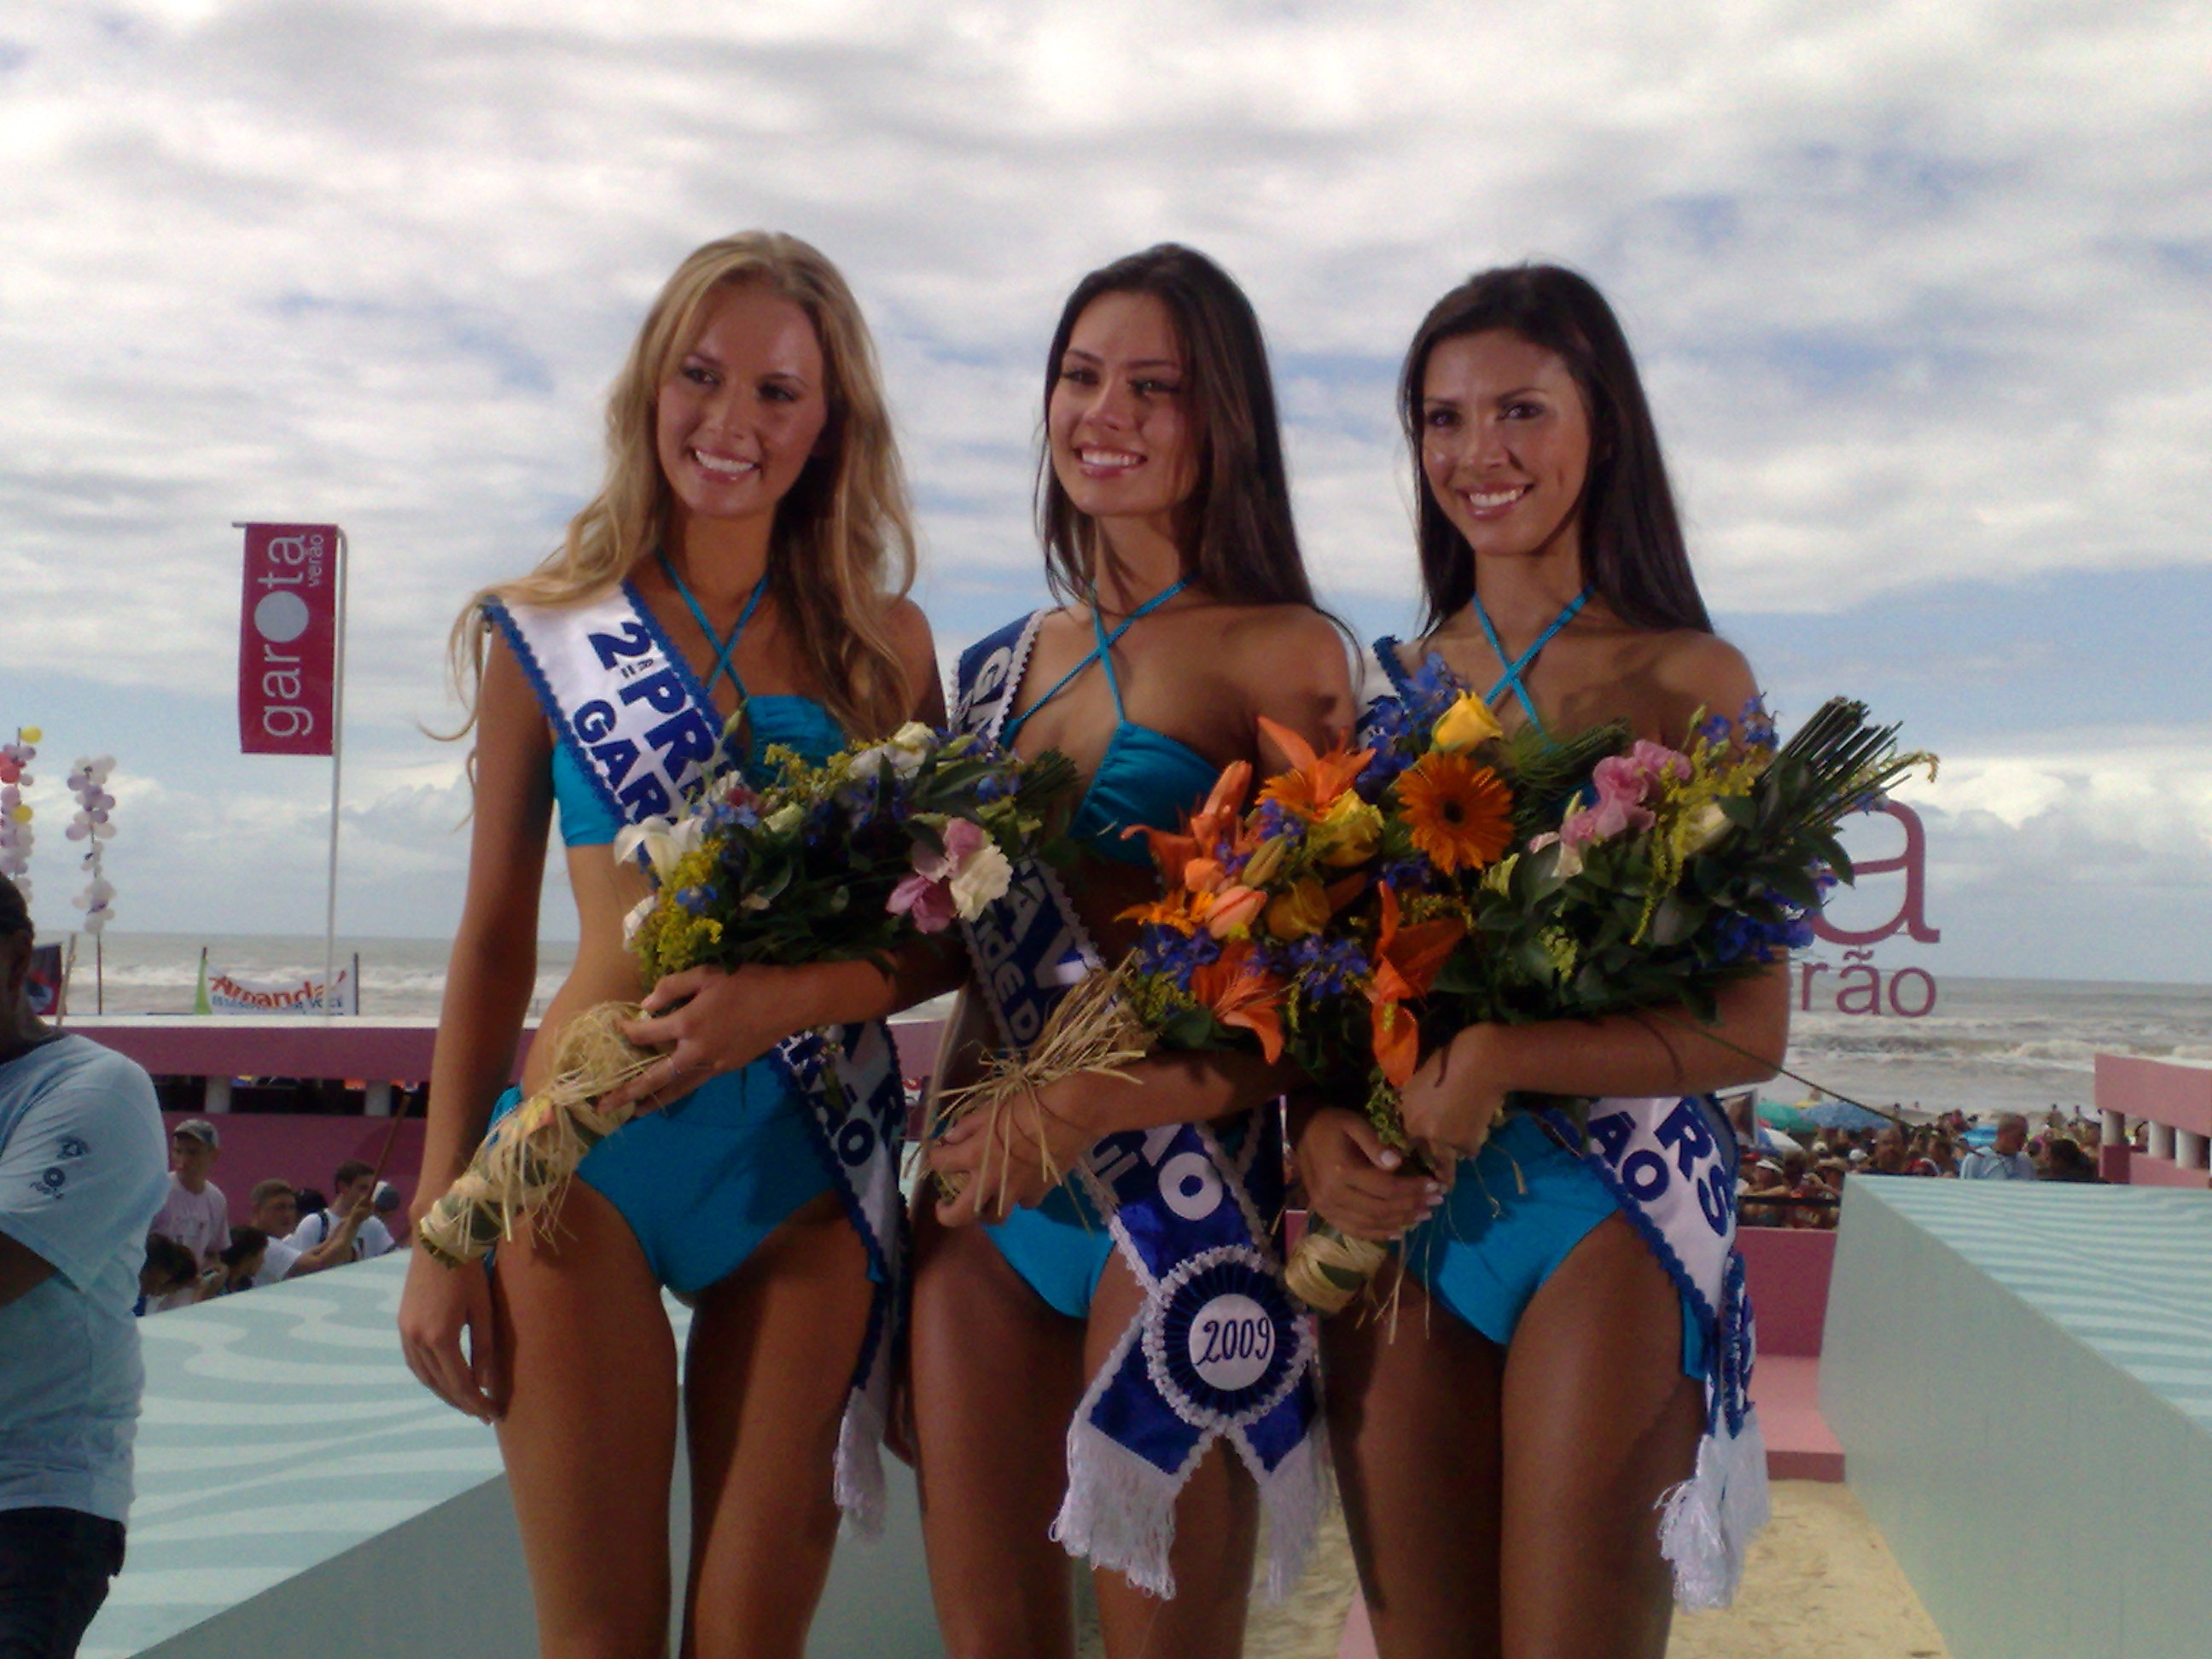 recordando garota verao 2009, a princesa foi a miss mundo brasil 2013. Yq28oig7